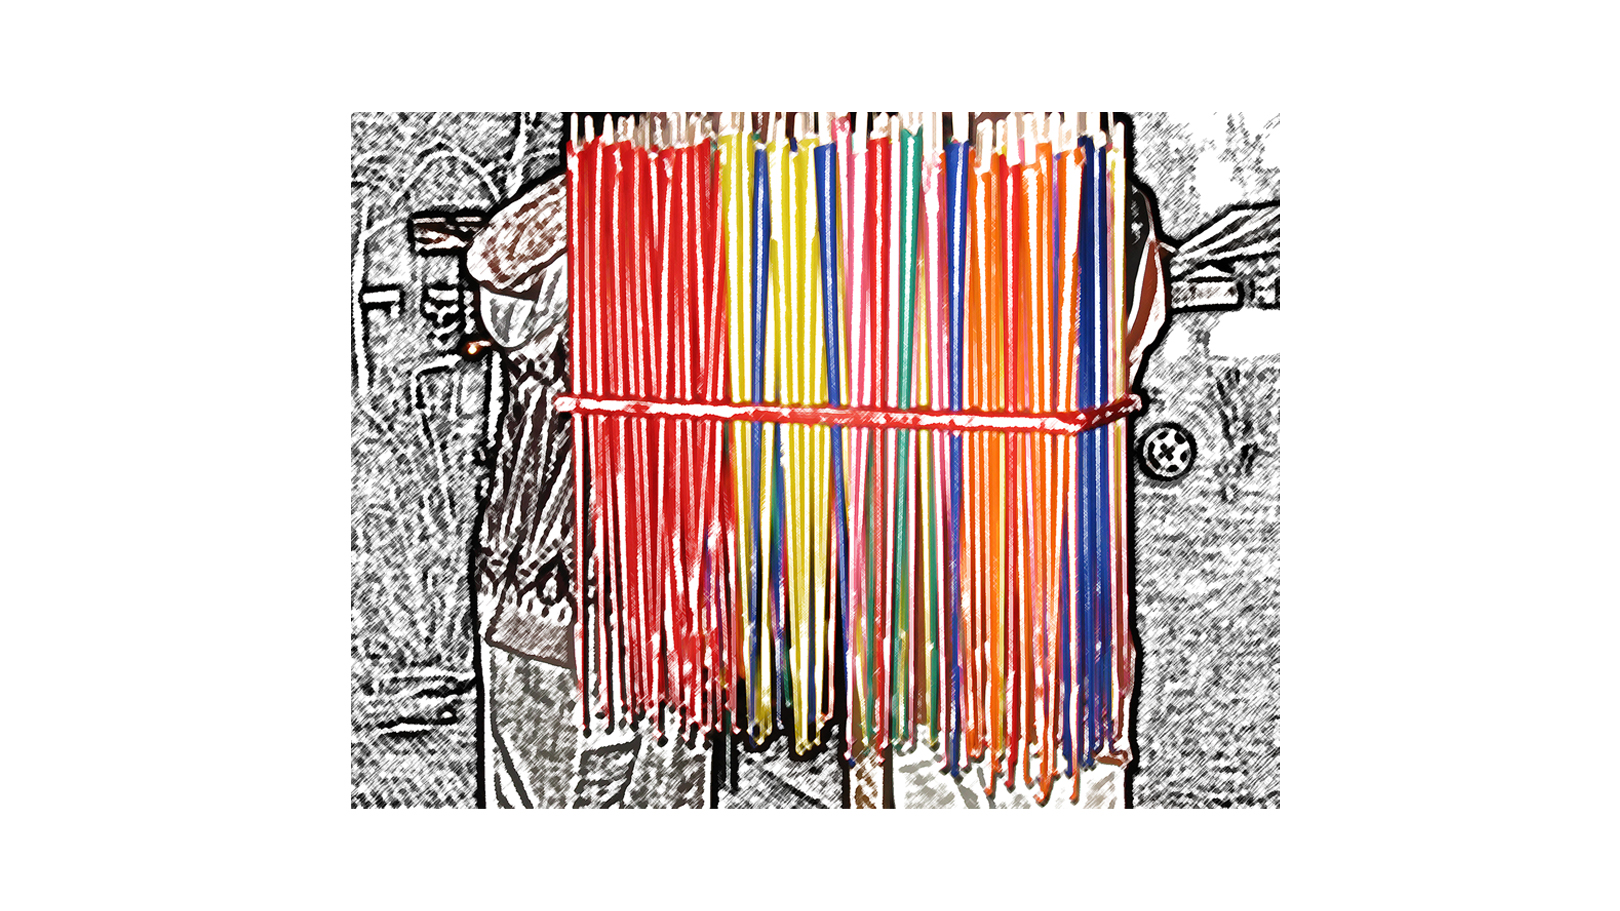 JPG portfolio digital art 12